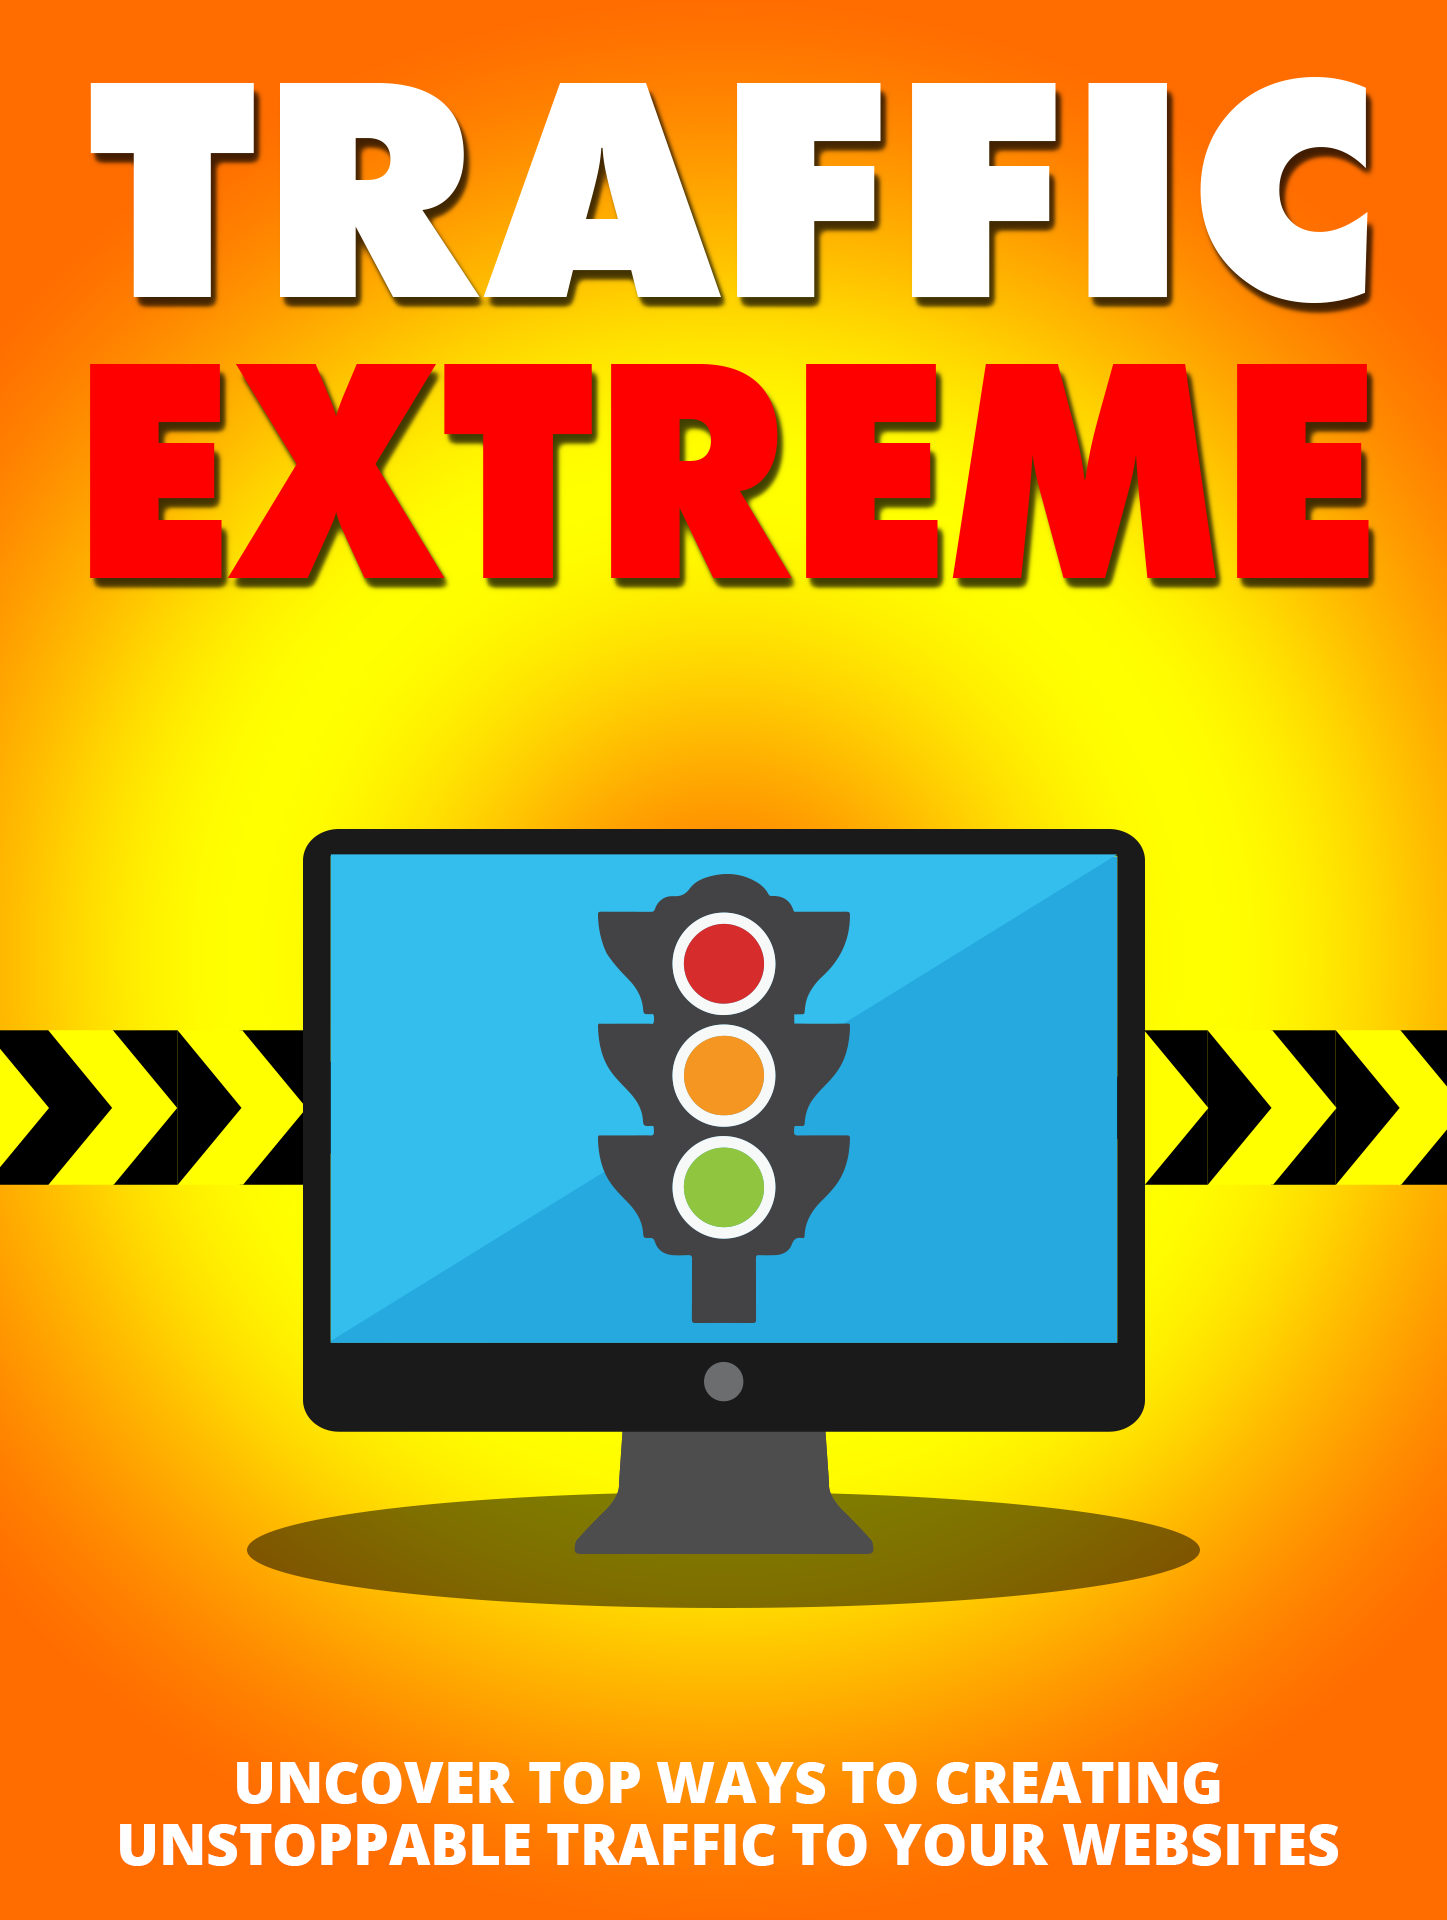 Traffic Extreme Traffic Extreme